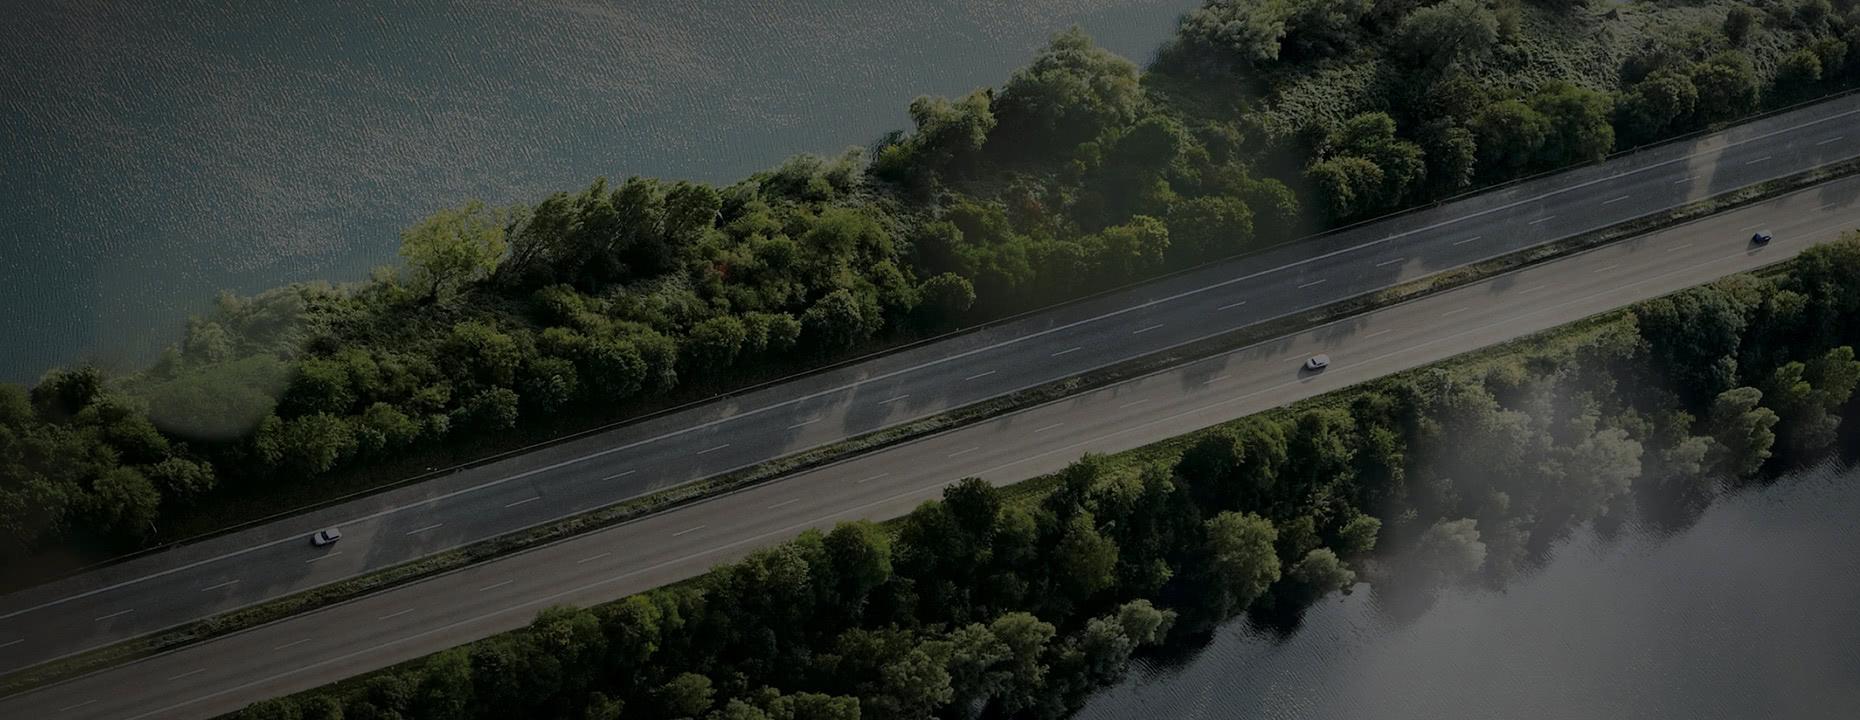 Hyundai Palisade та концепт Le Fil Rouge здобули премії iF Design Awards-2019 | Автопланета - фото 8